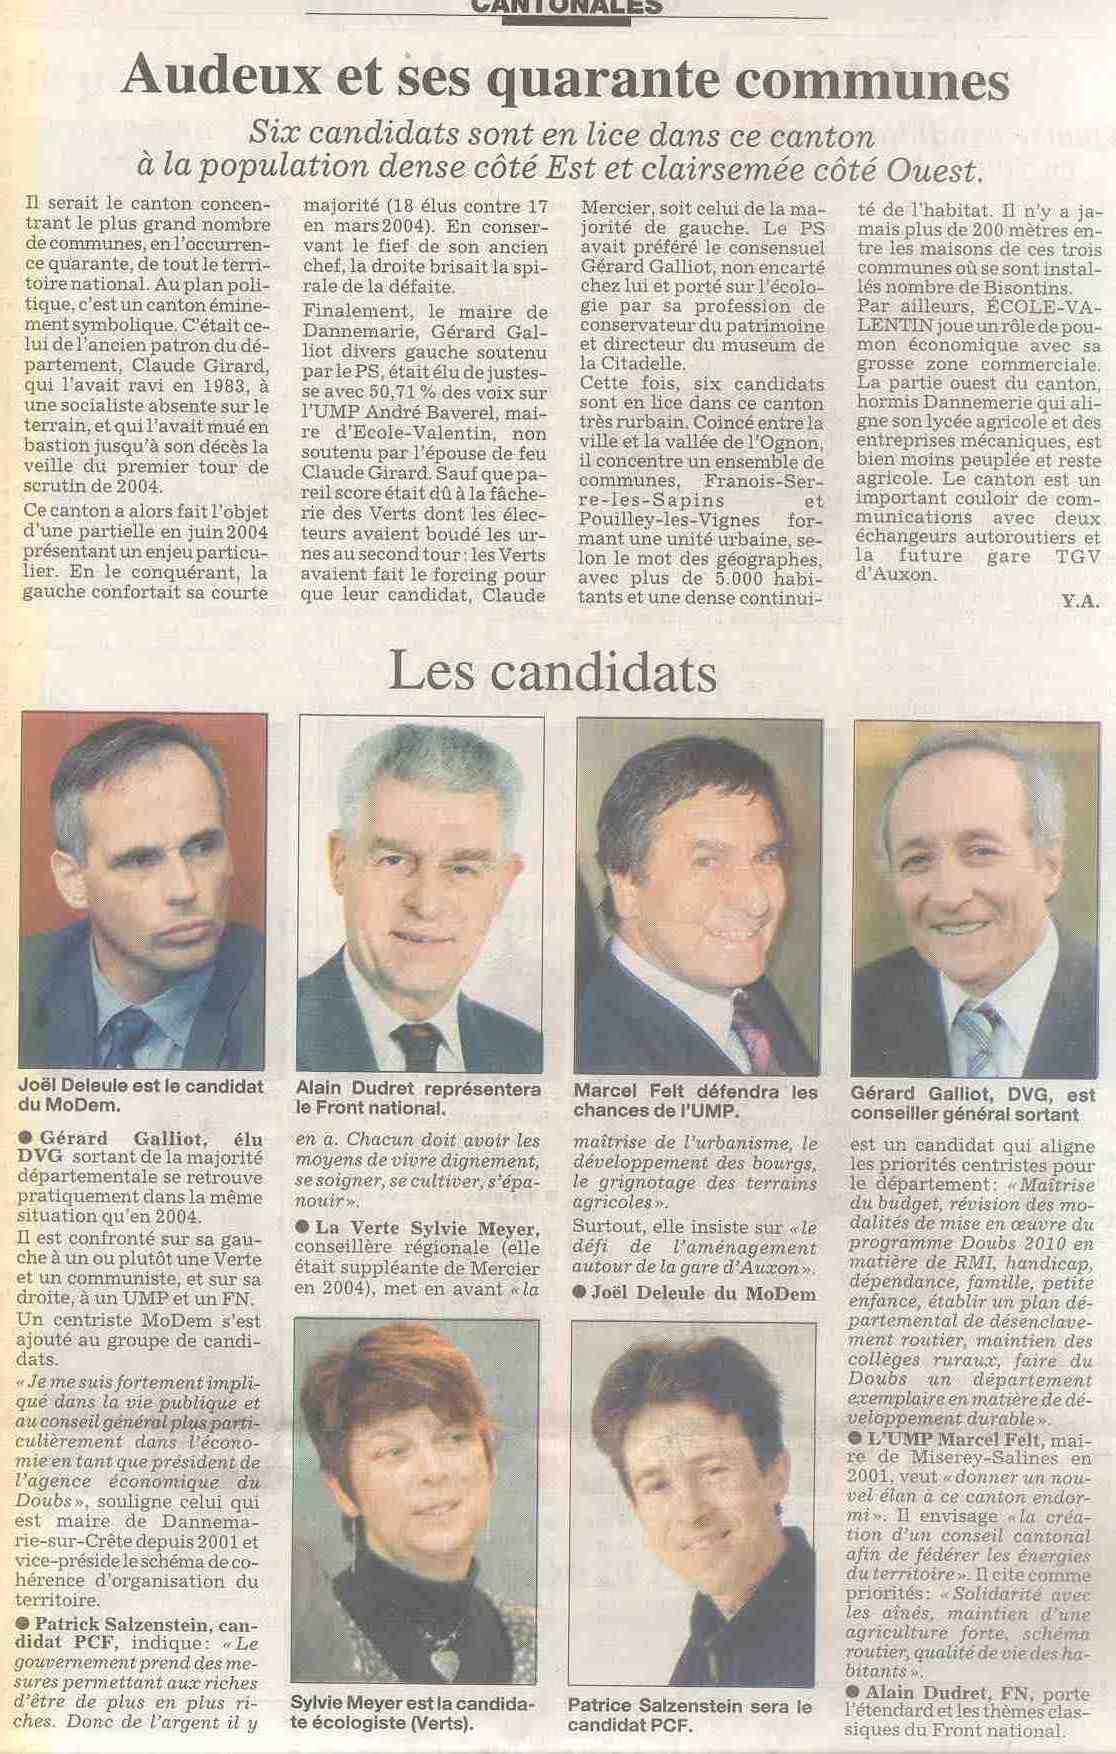 http://mvtpaix25.free.fr/2008/080306-est-republicain.jpg